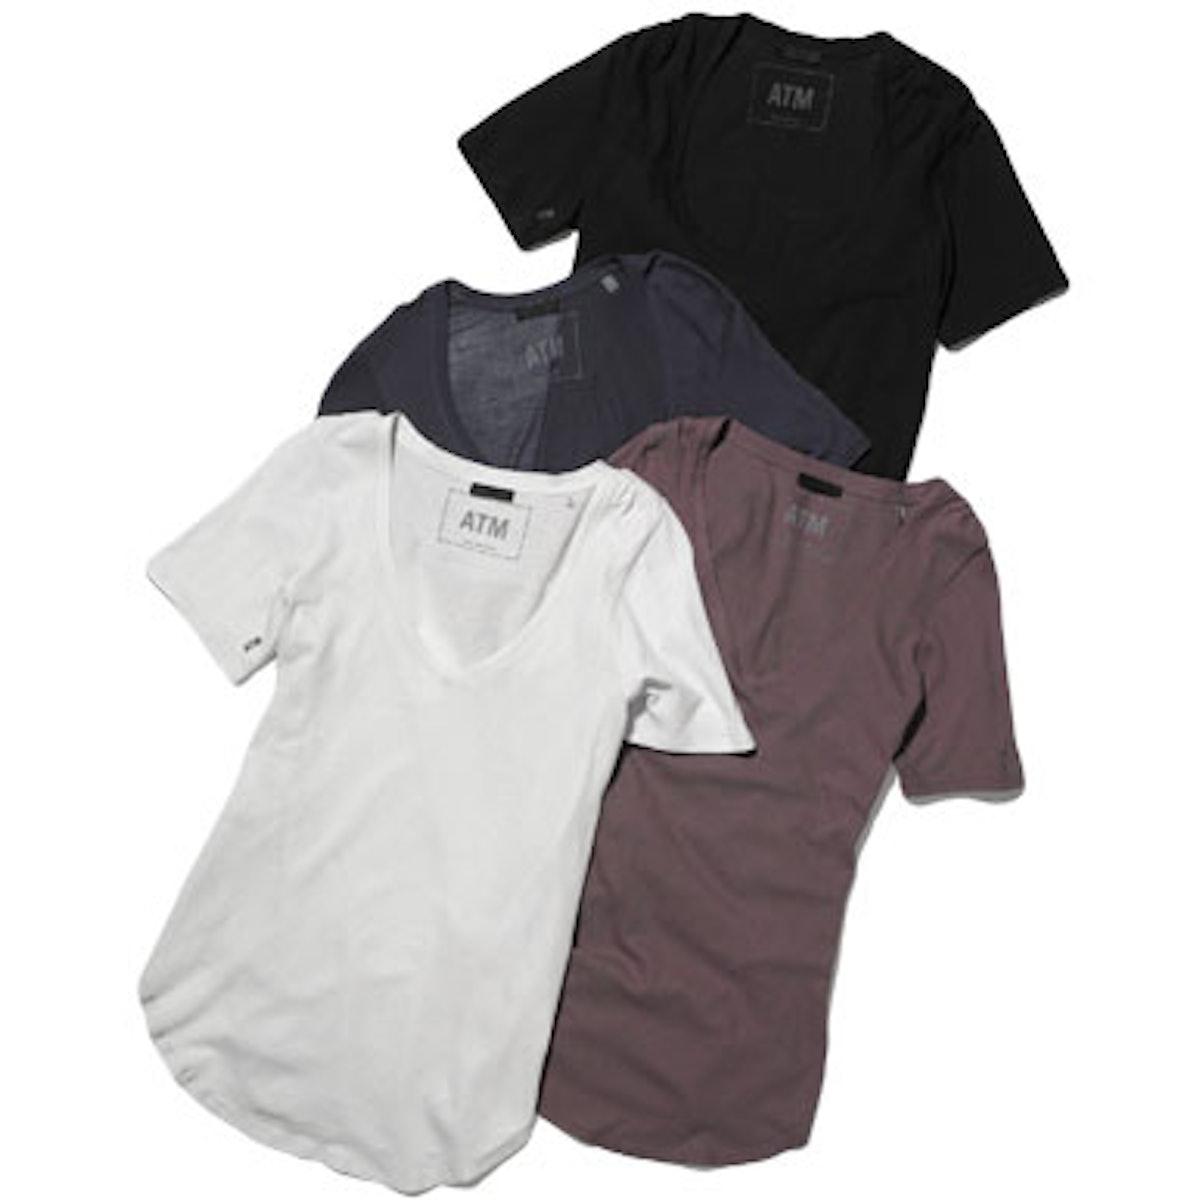 blog-atm-t-shirts-barneys-02.jpg